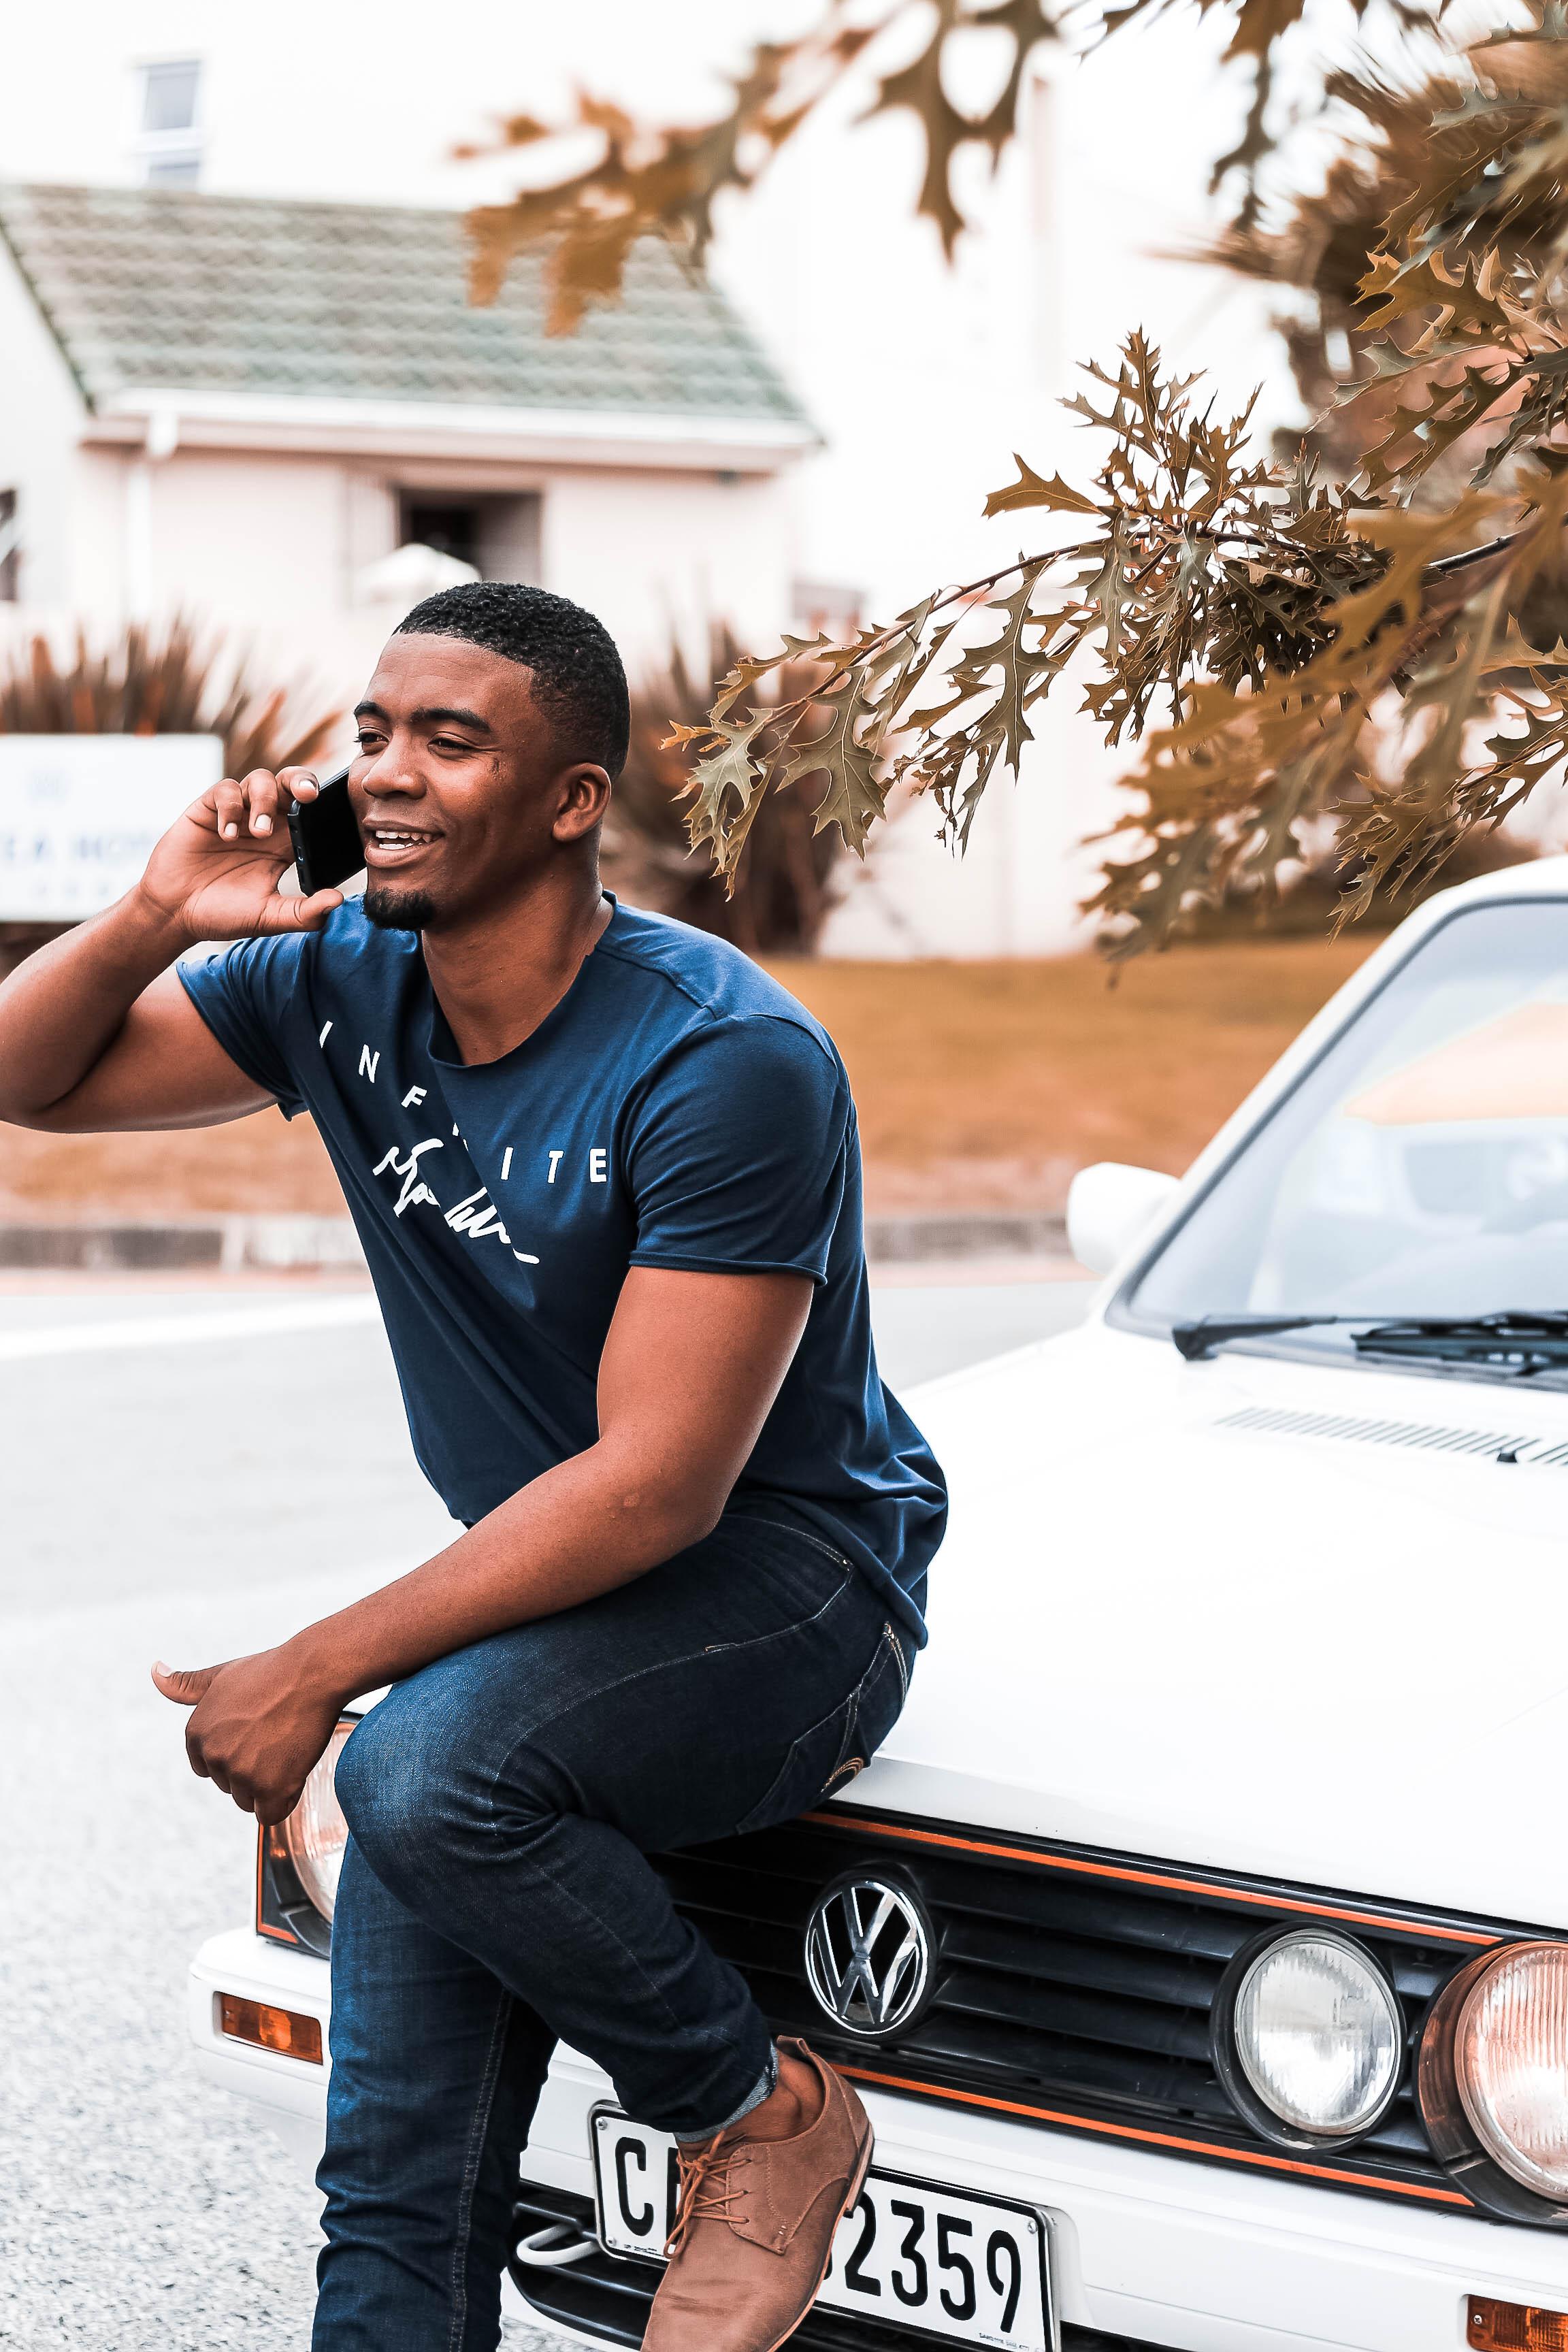 Man Holding Smartphone White Leaning on Vehicle